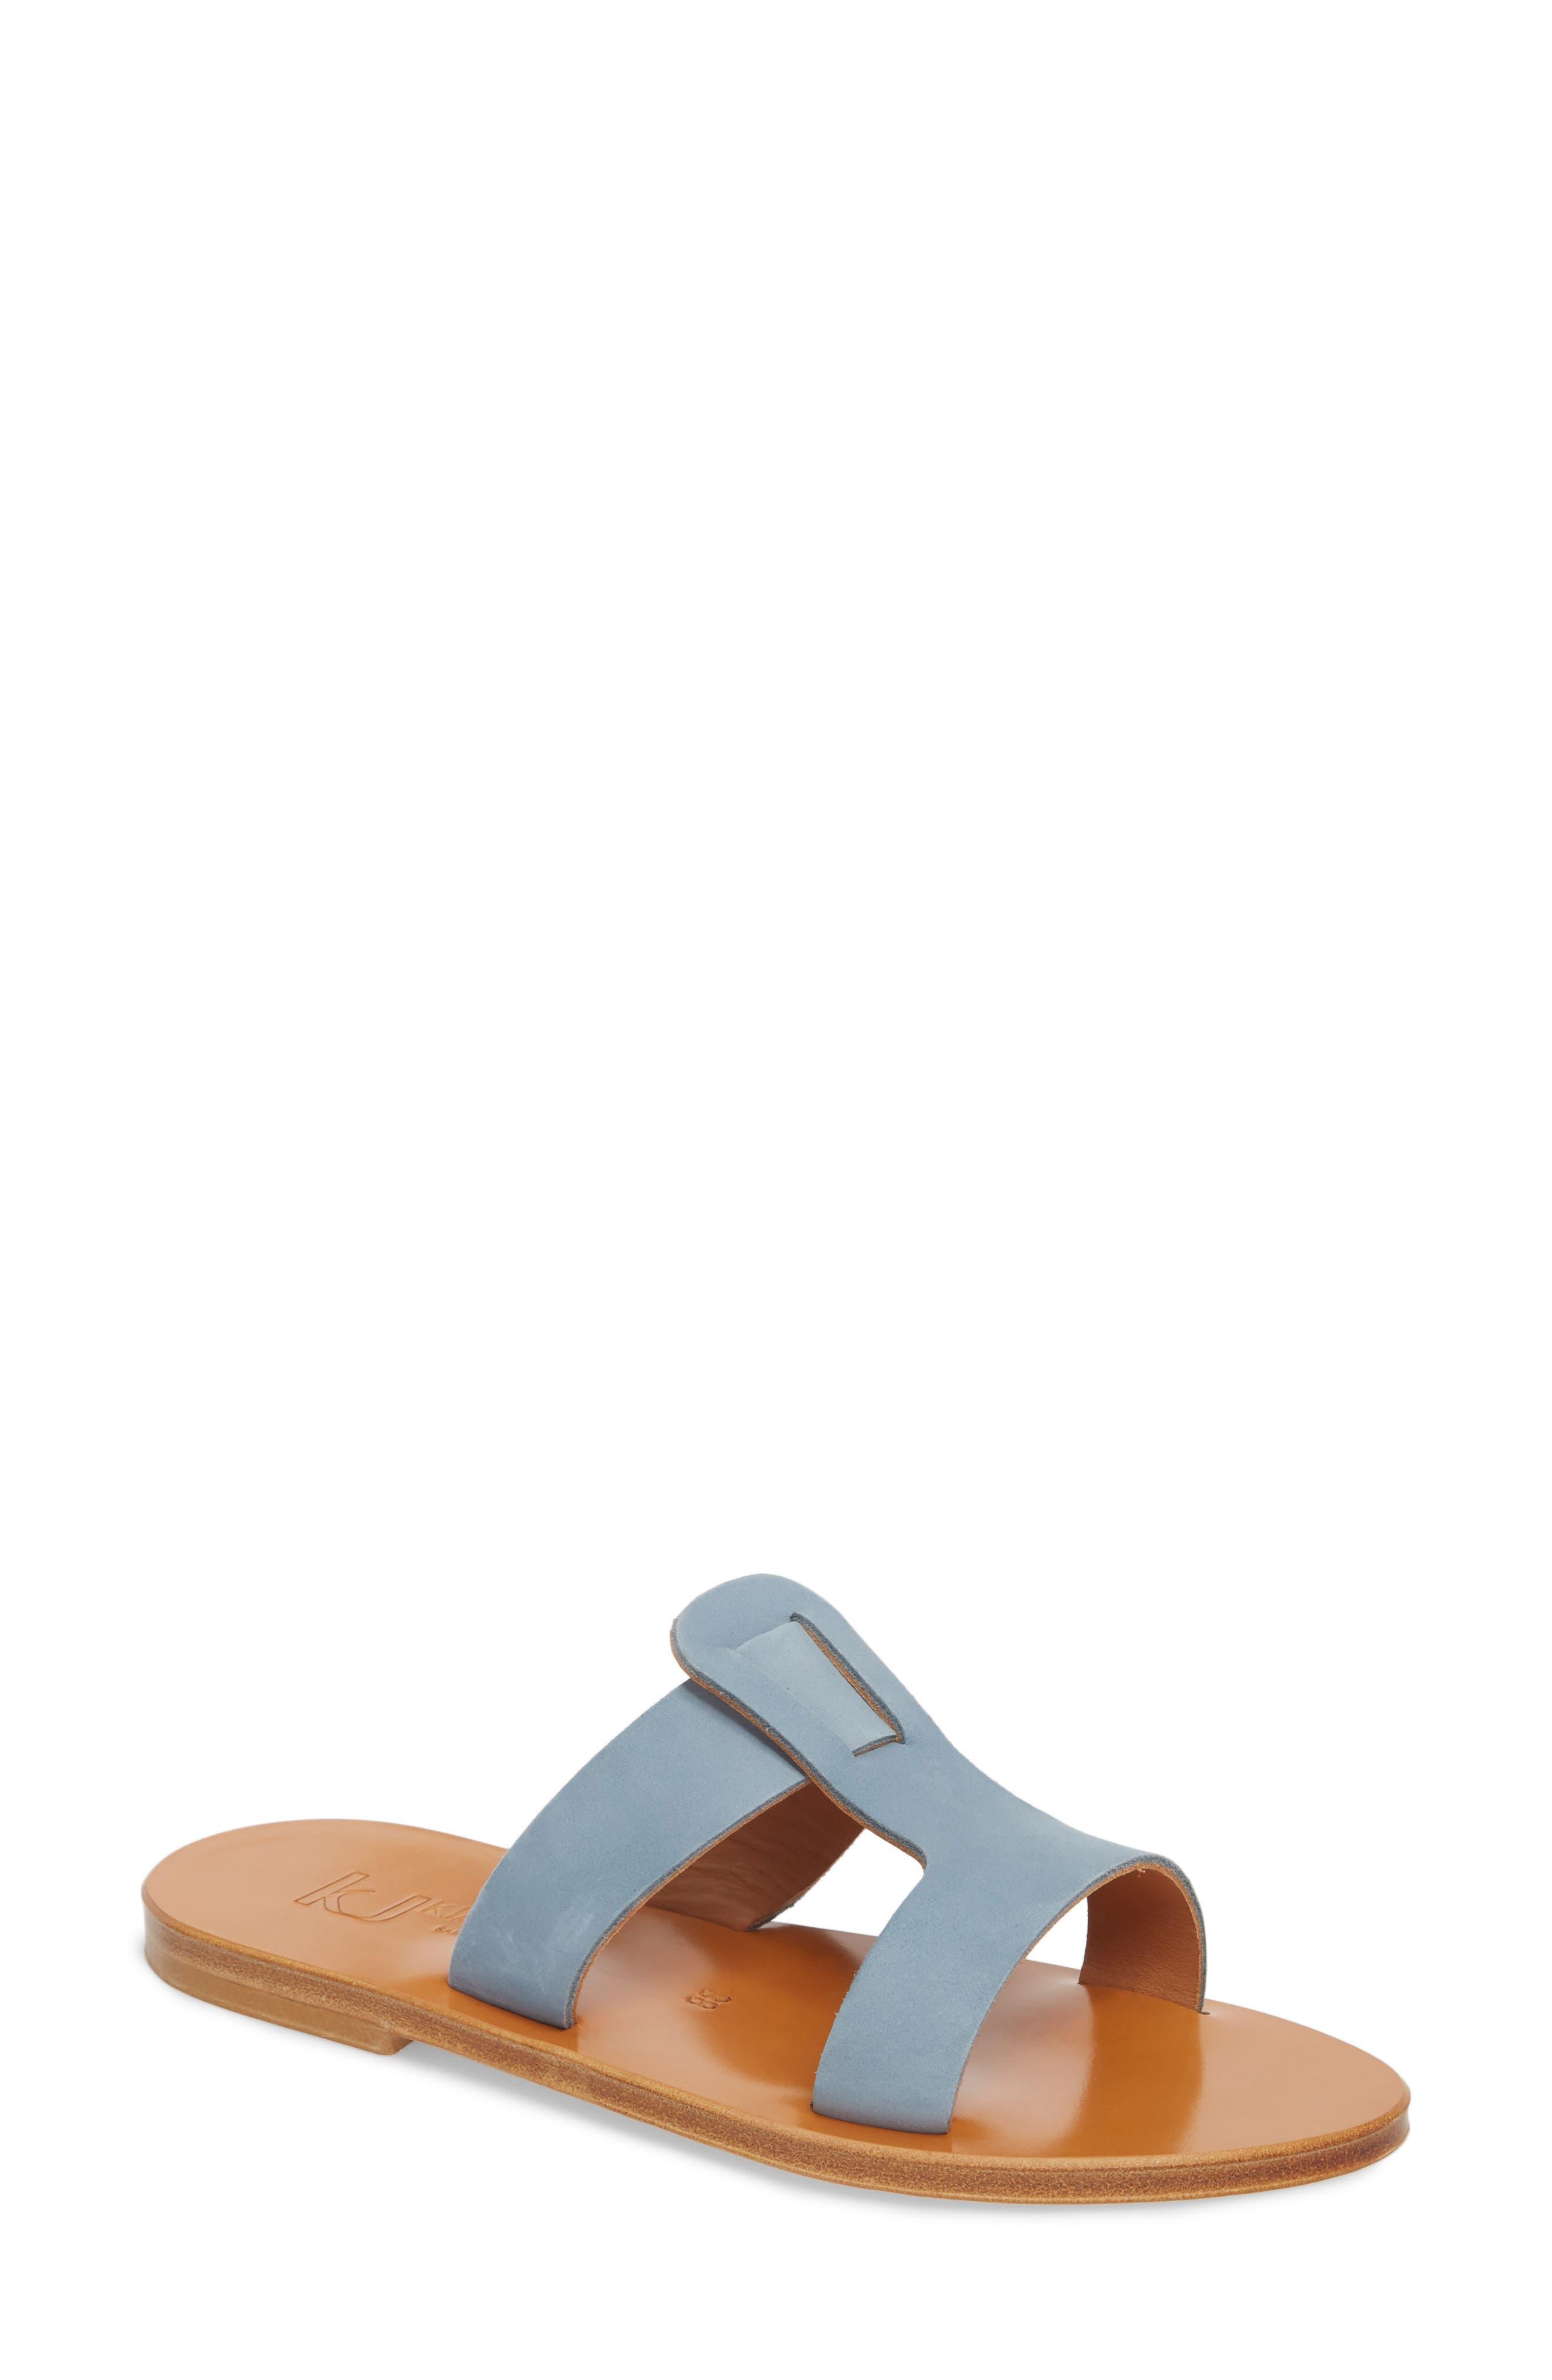 K. Jacques St. Tropez Slide Sandal (Women)